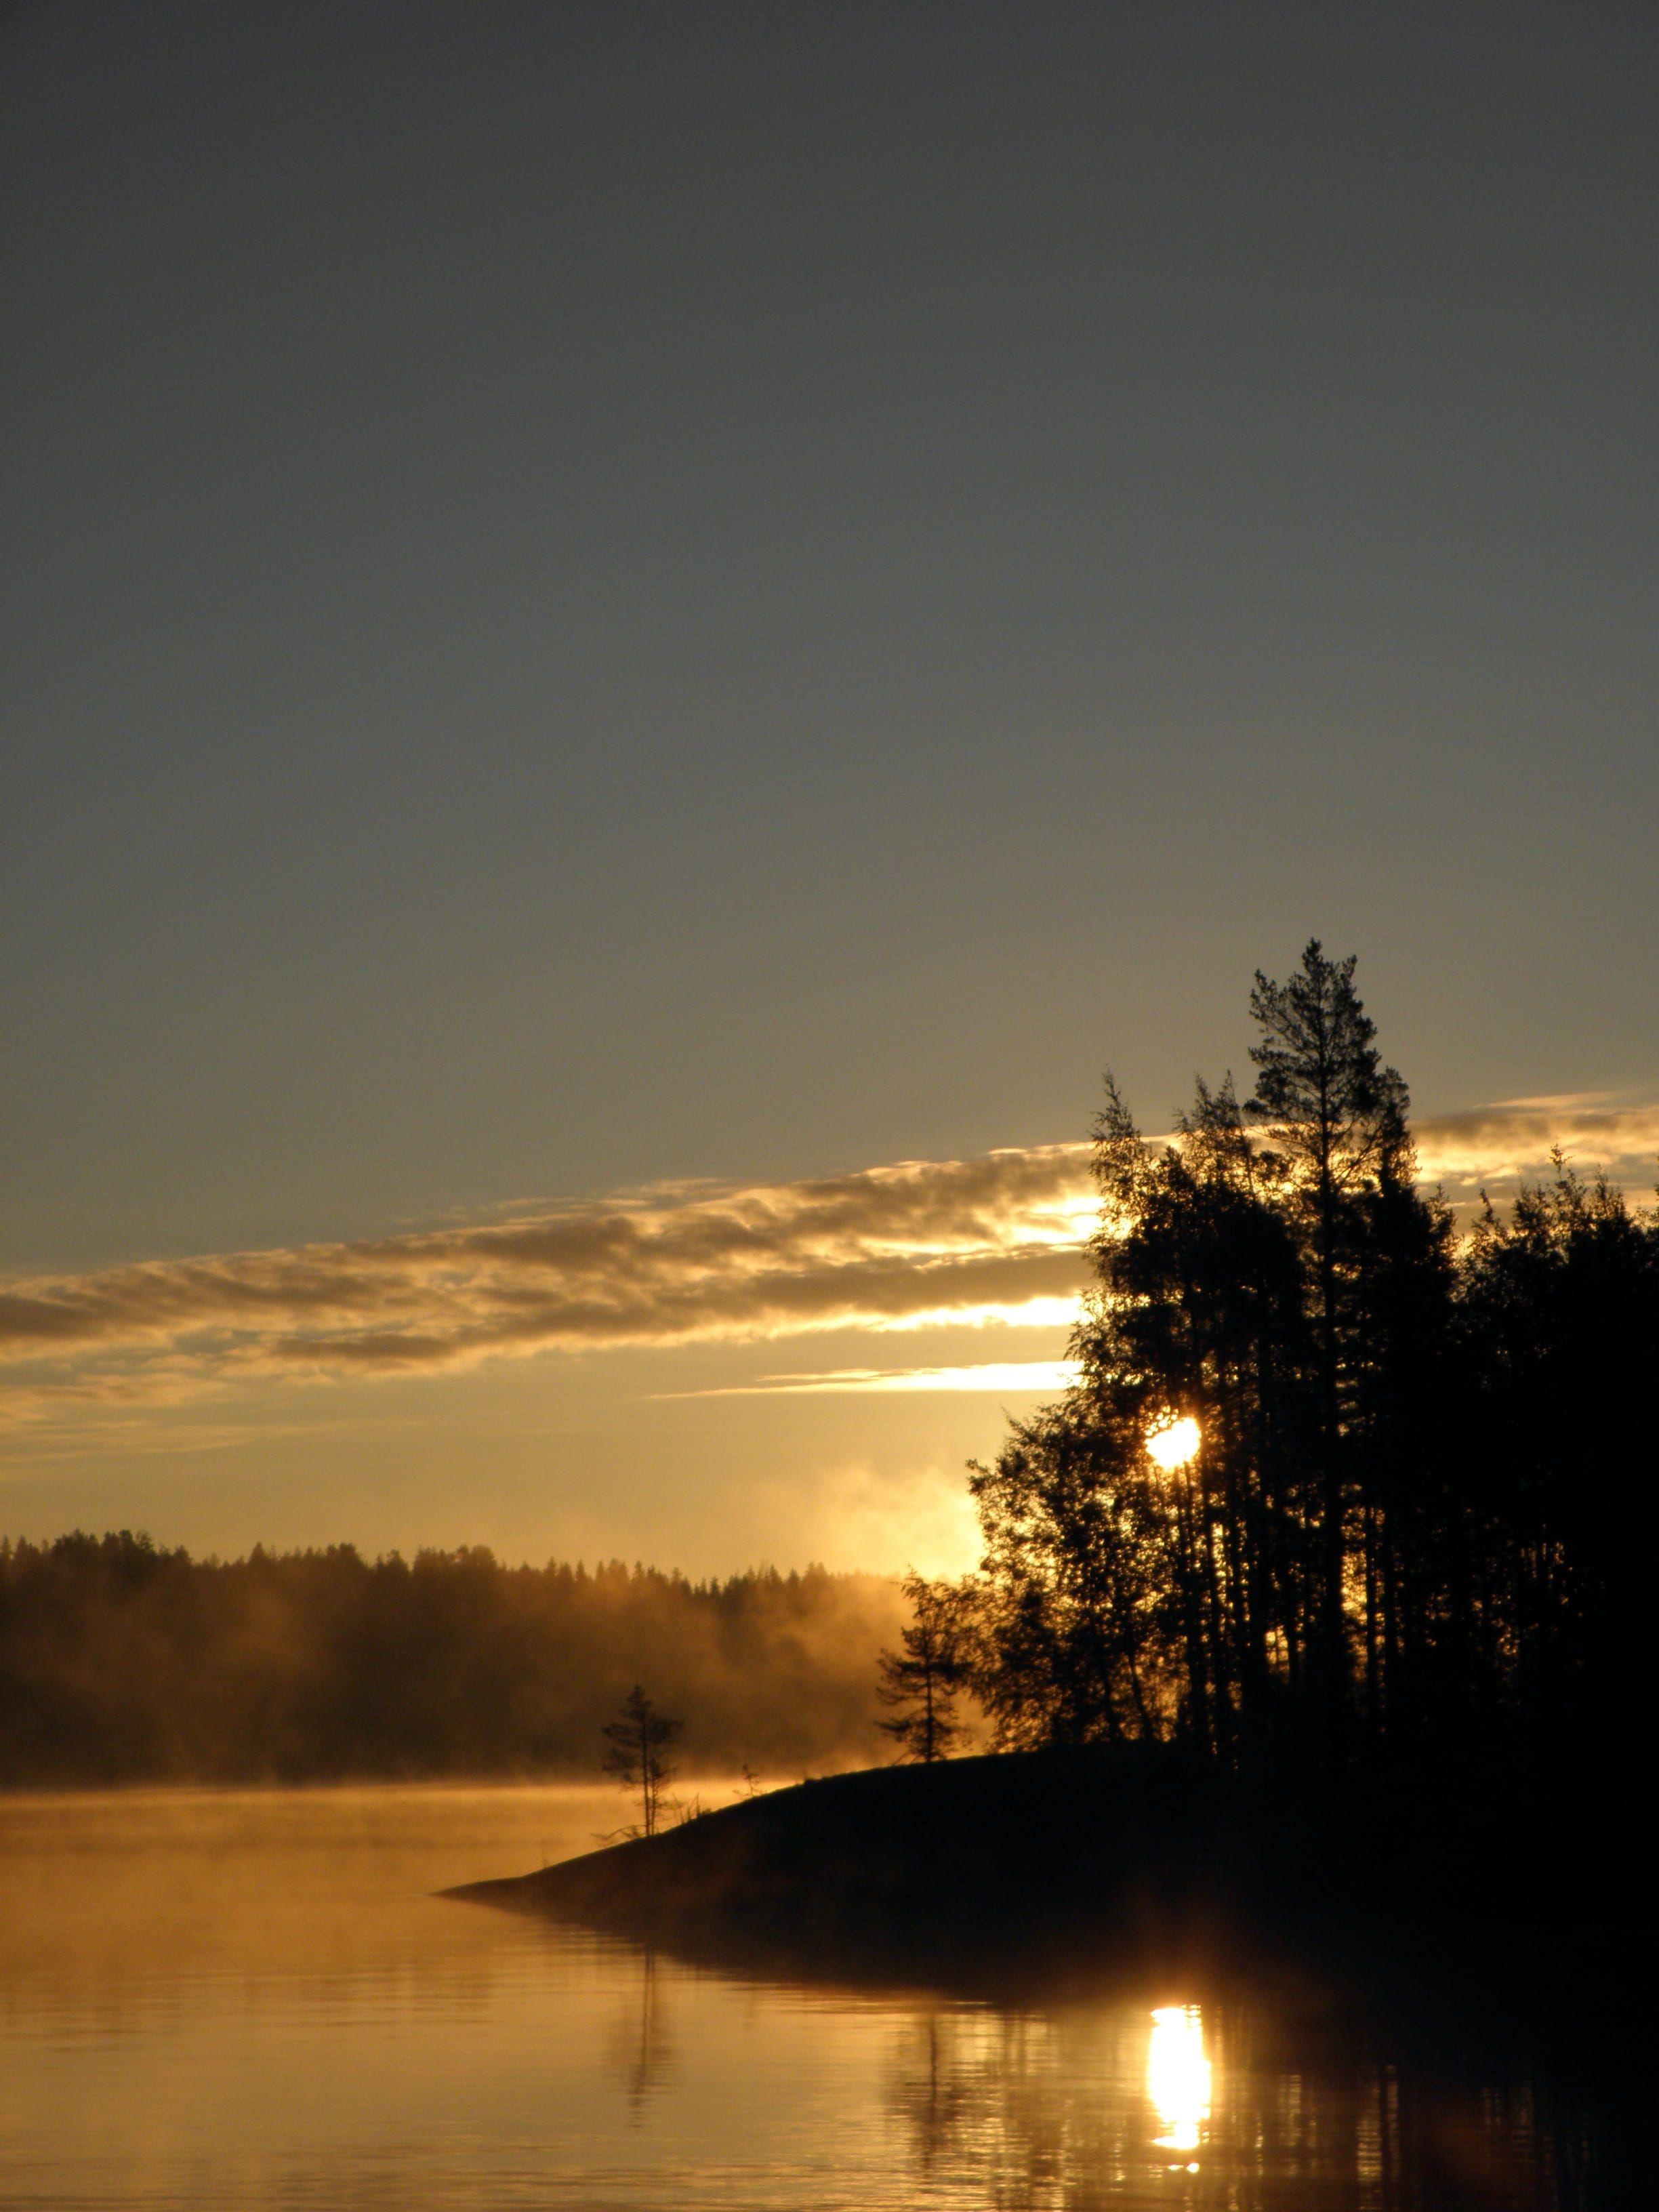 Sun Finnish Savonlinna Saimaa Sky Water Lake In Finland Nature Sunny Lake Archipelago Landscape Autumn Sunshine Septembe In 2021 Finland Hd Wallpaper Sky